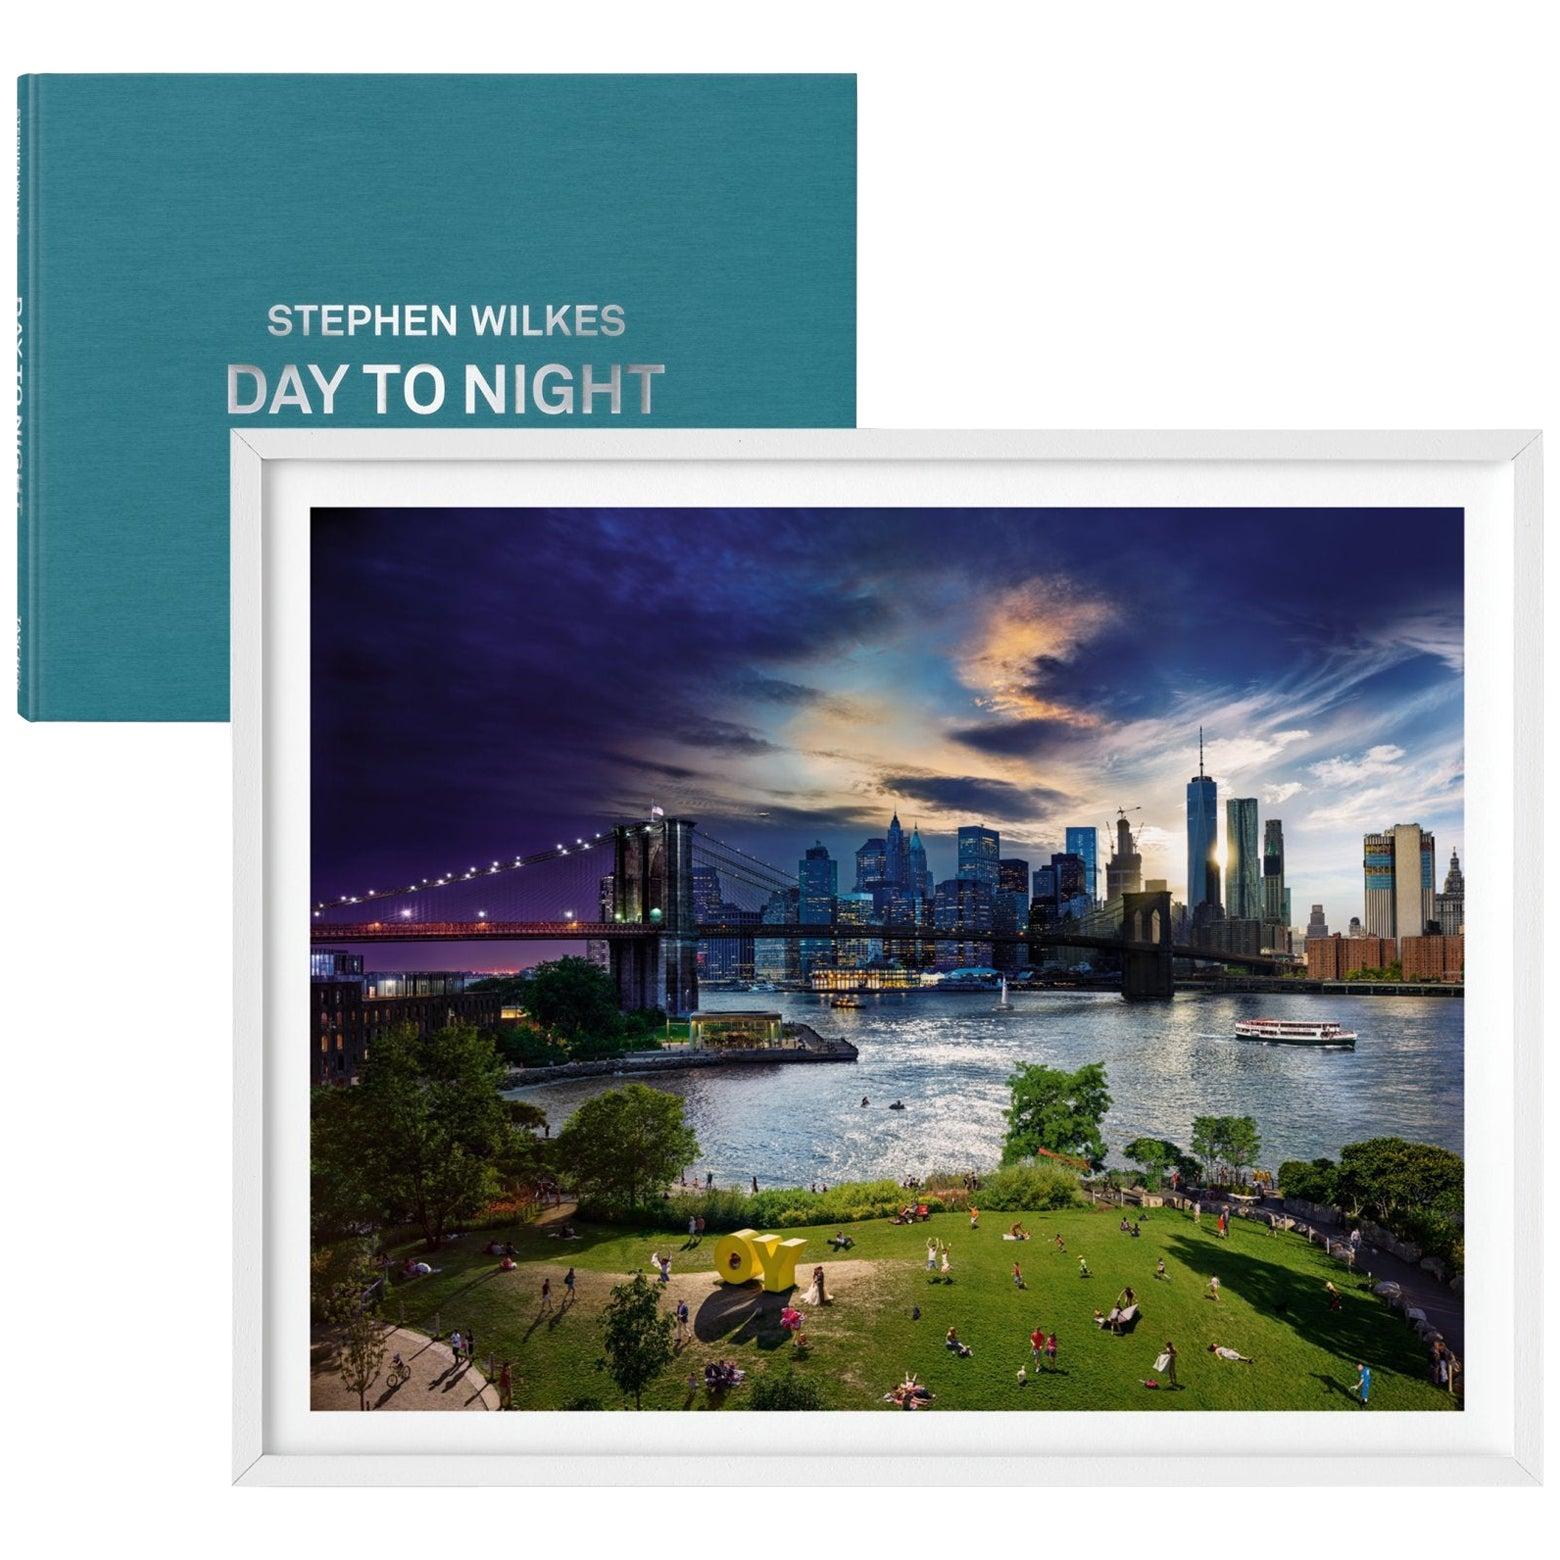 Stephen Wilkes, Day to Night, Art Edition No. 1-100 'Brooklyn Bridge, NYC'